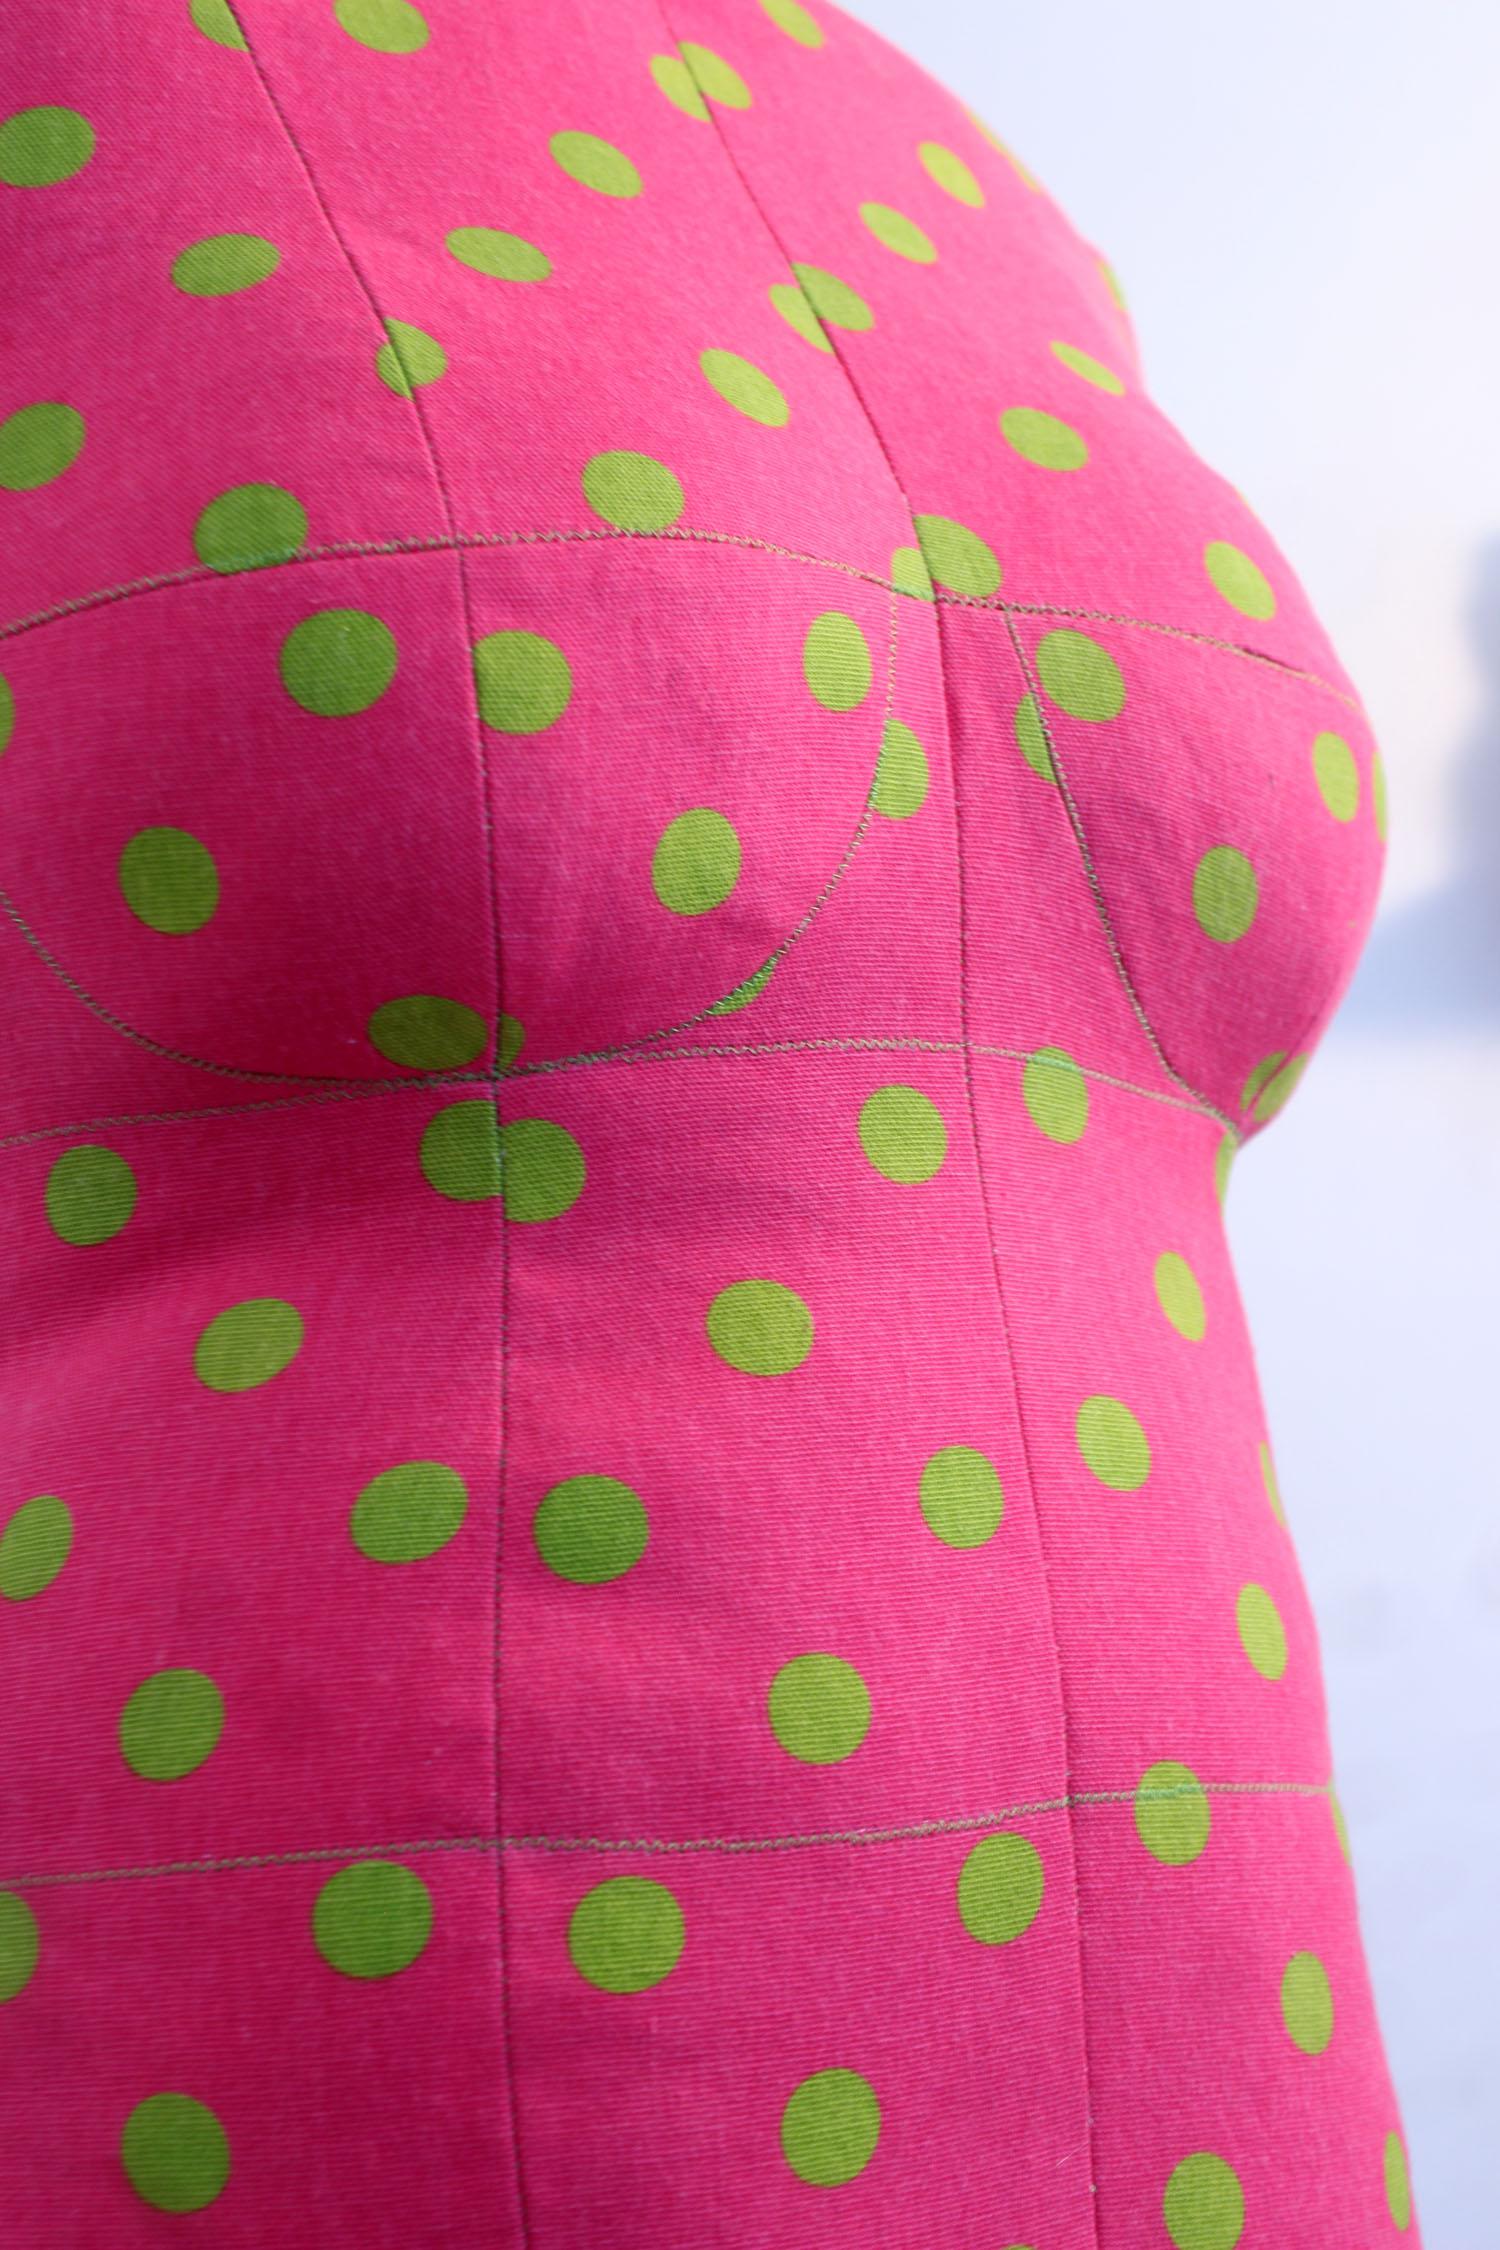 dressform extreme closeup.jpg